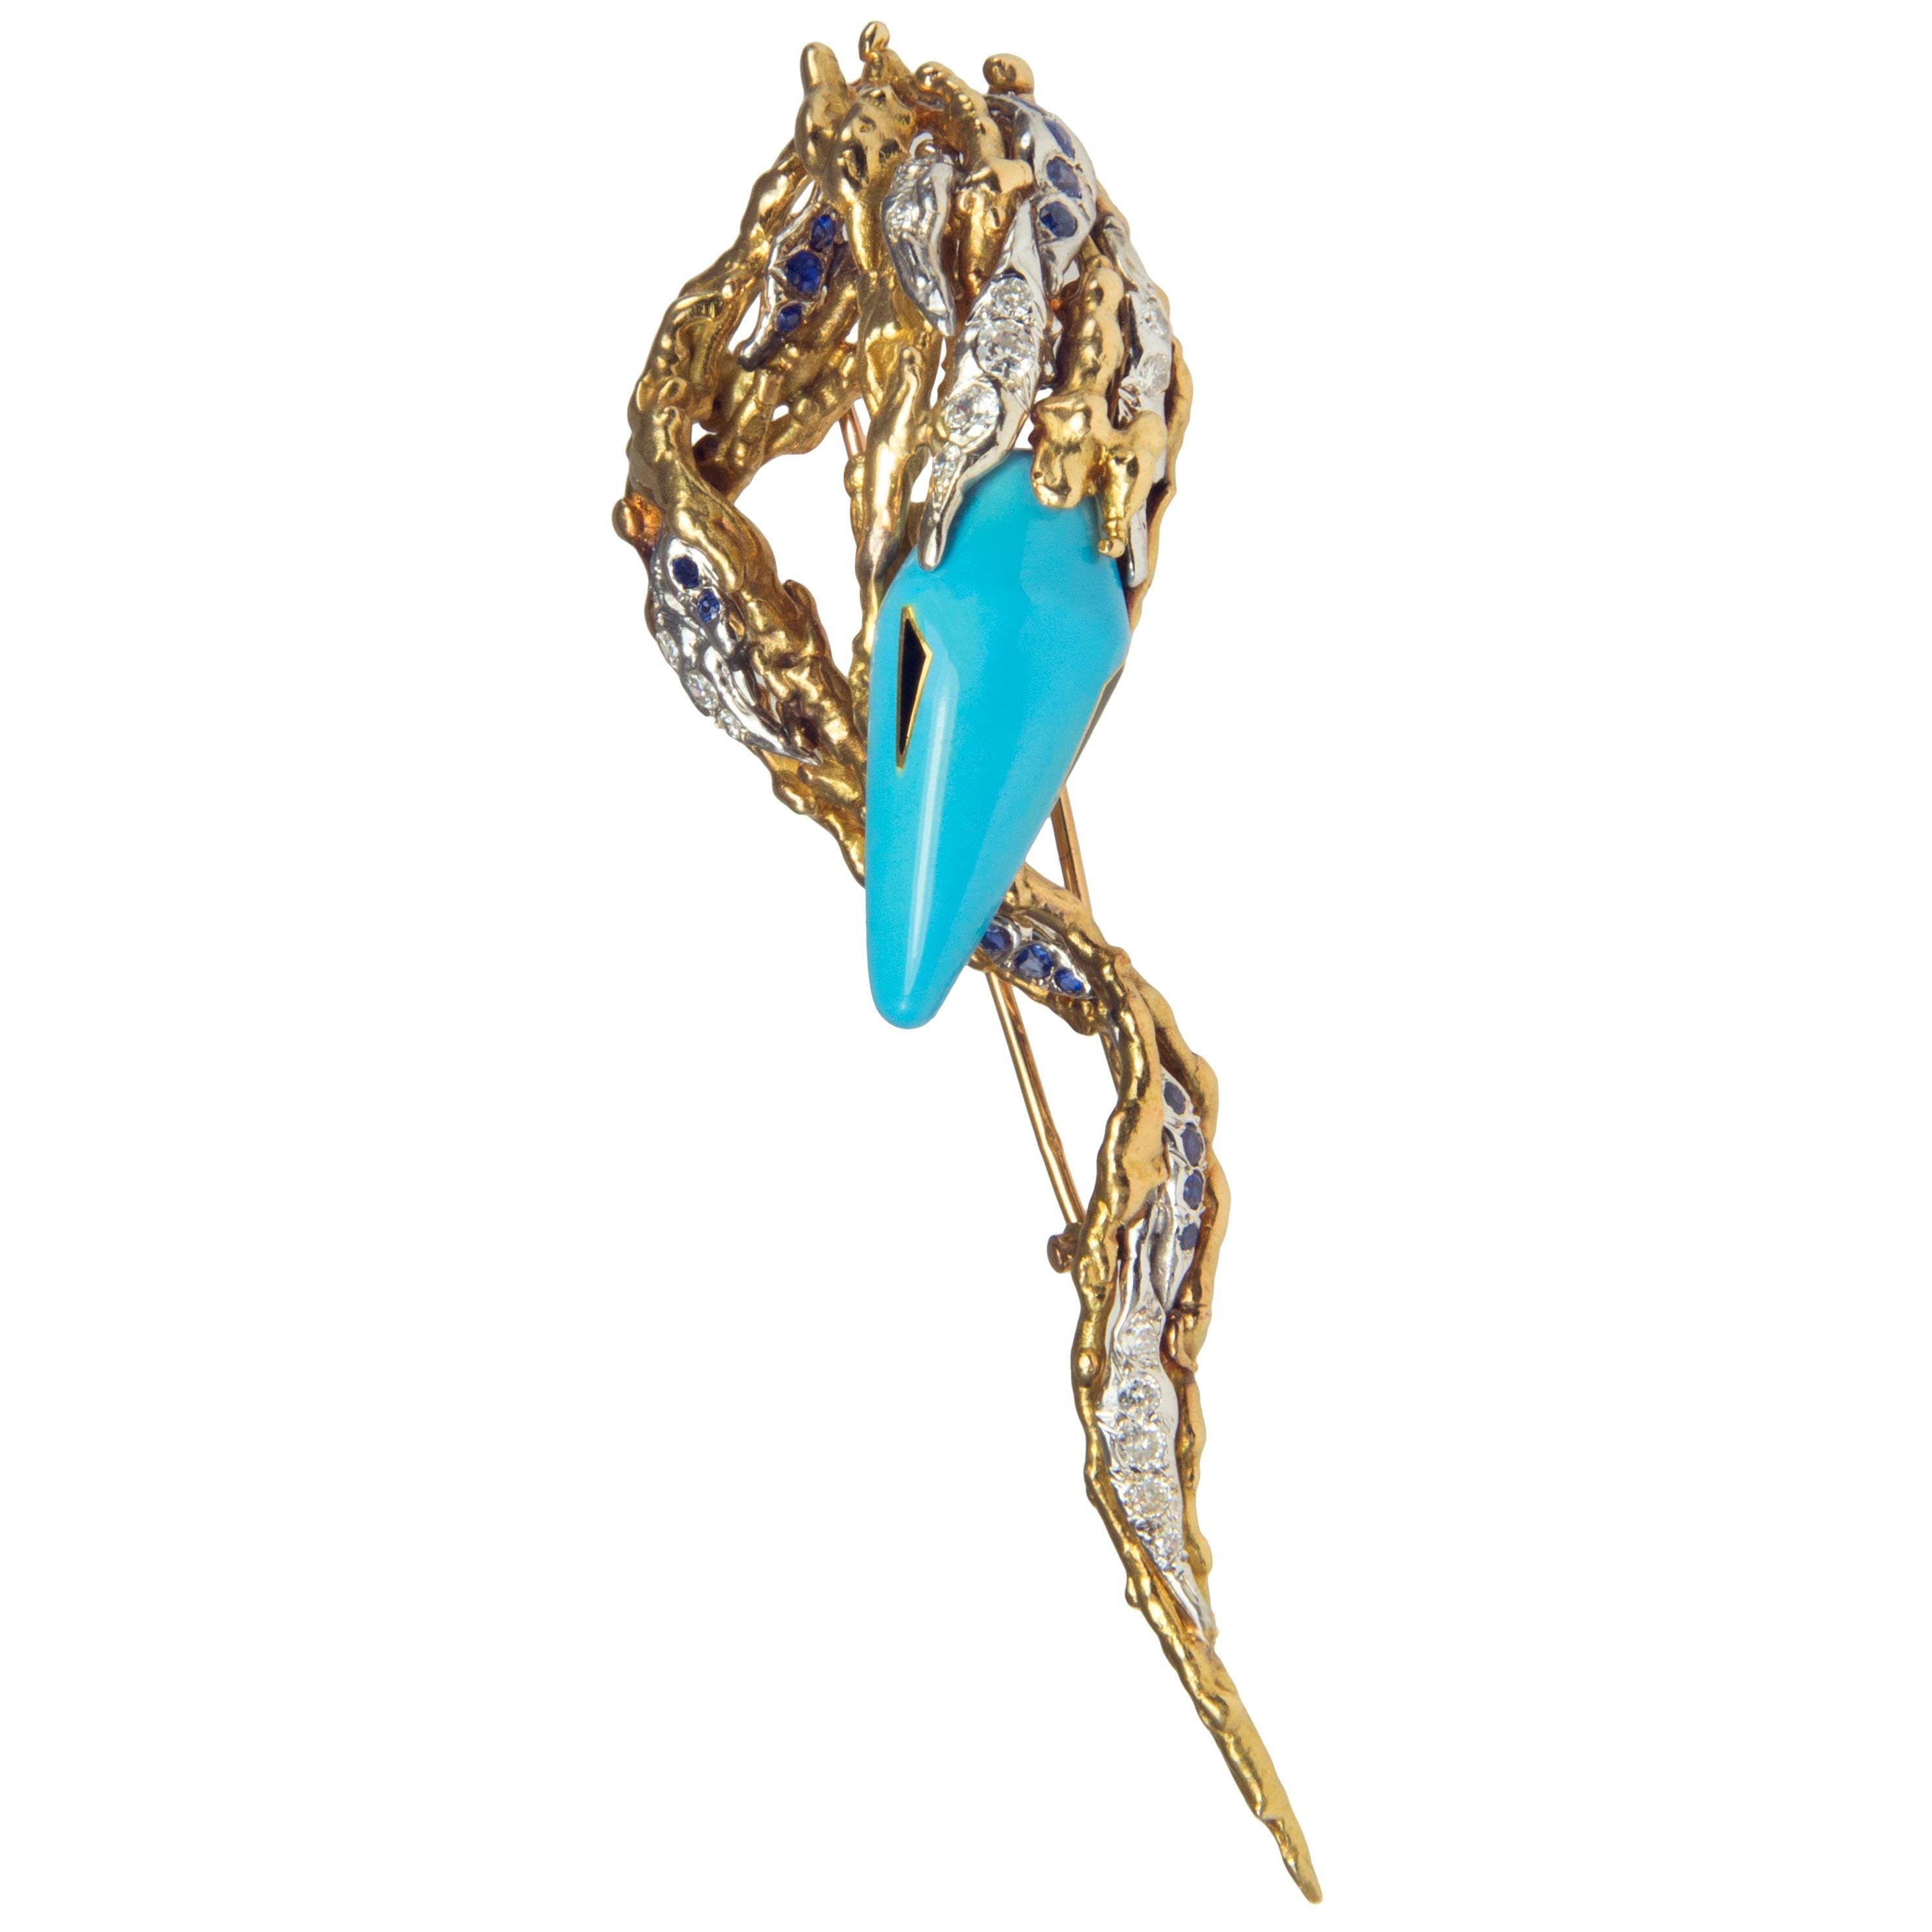 1960s Sterlé Paris, Enamel, Diamond, Sapphire and Gold Brooch